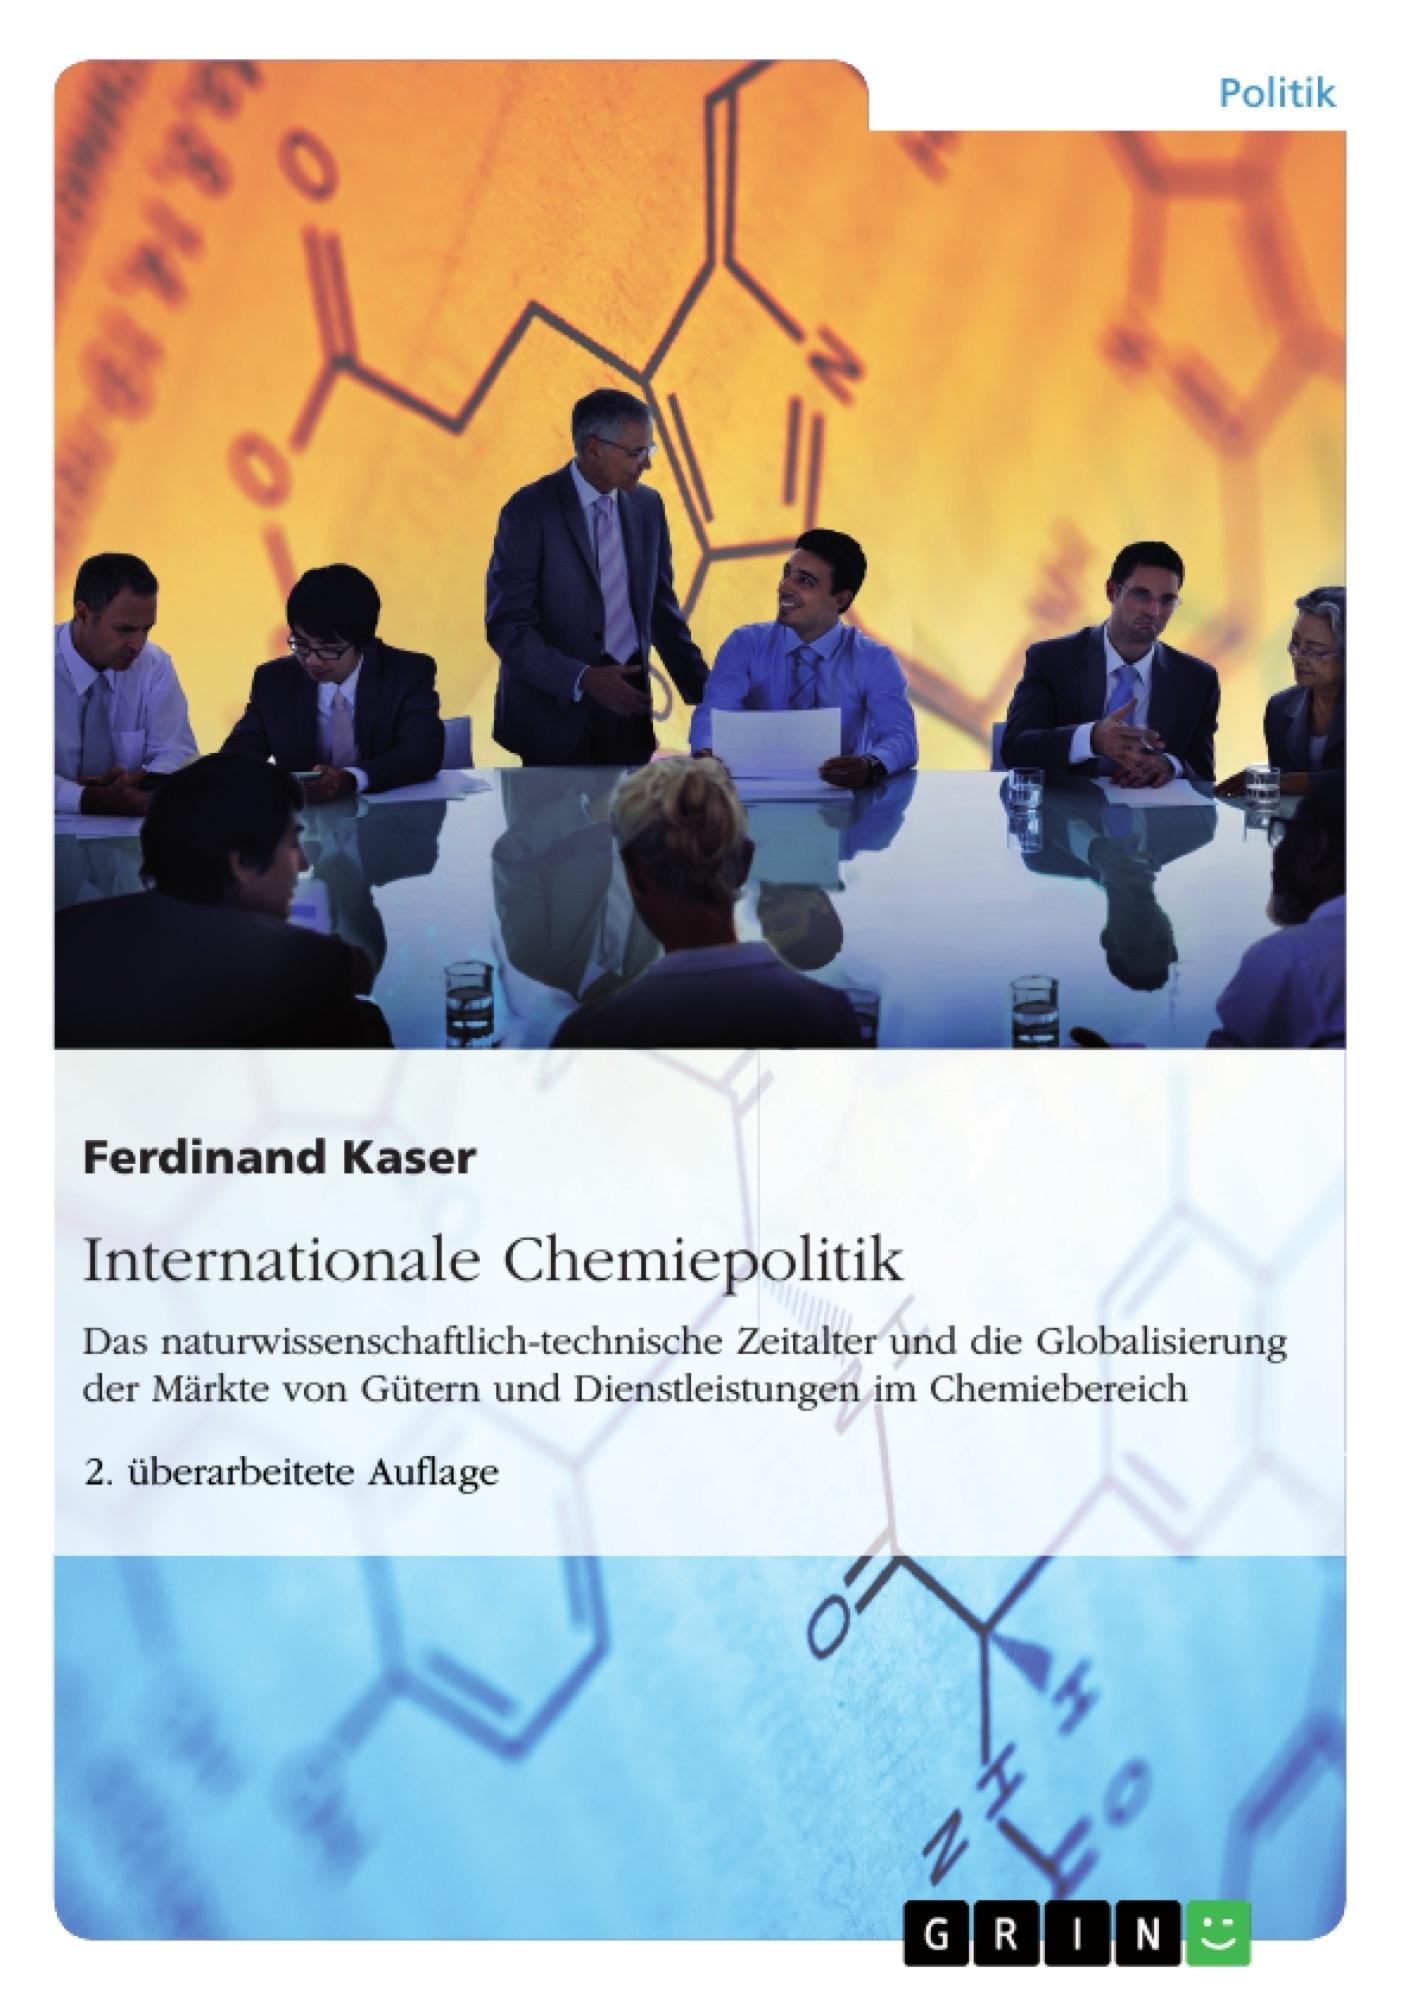 Titel: Internationale Chemiepolitik